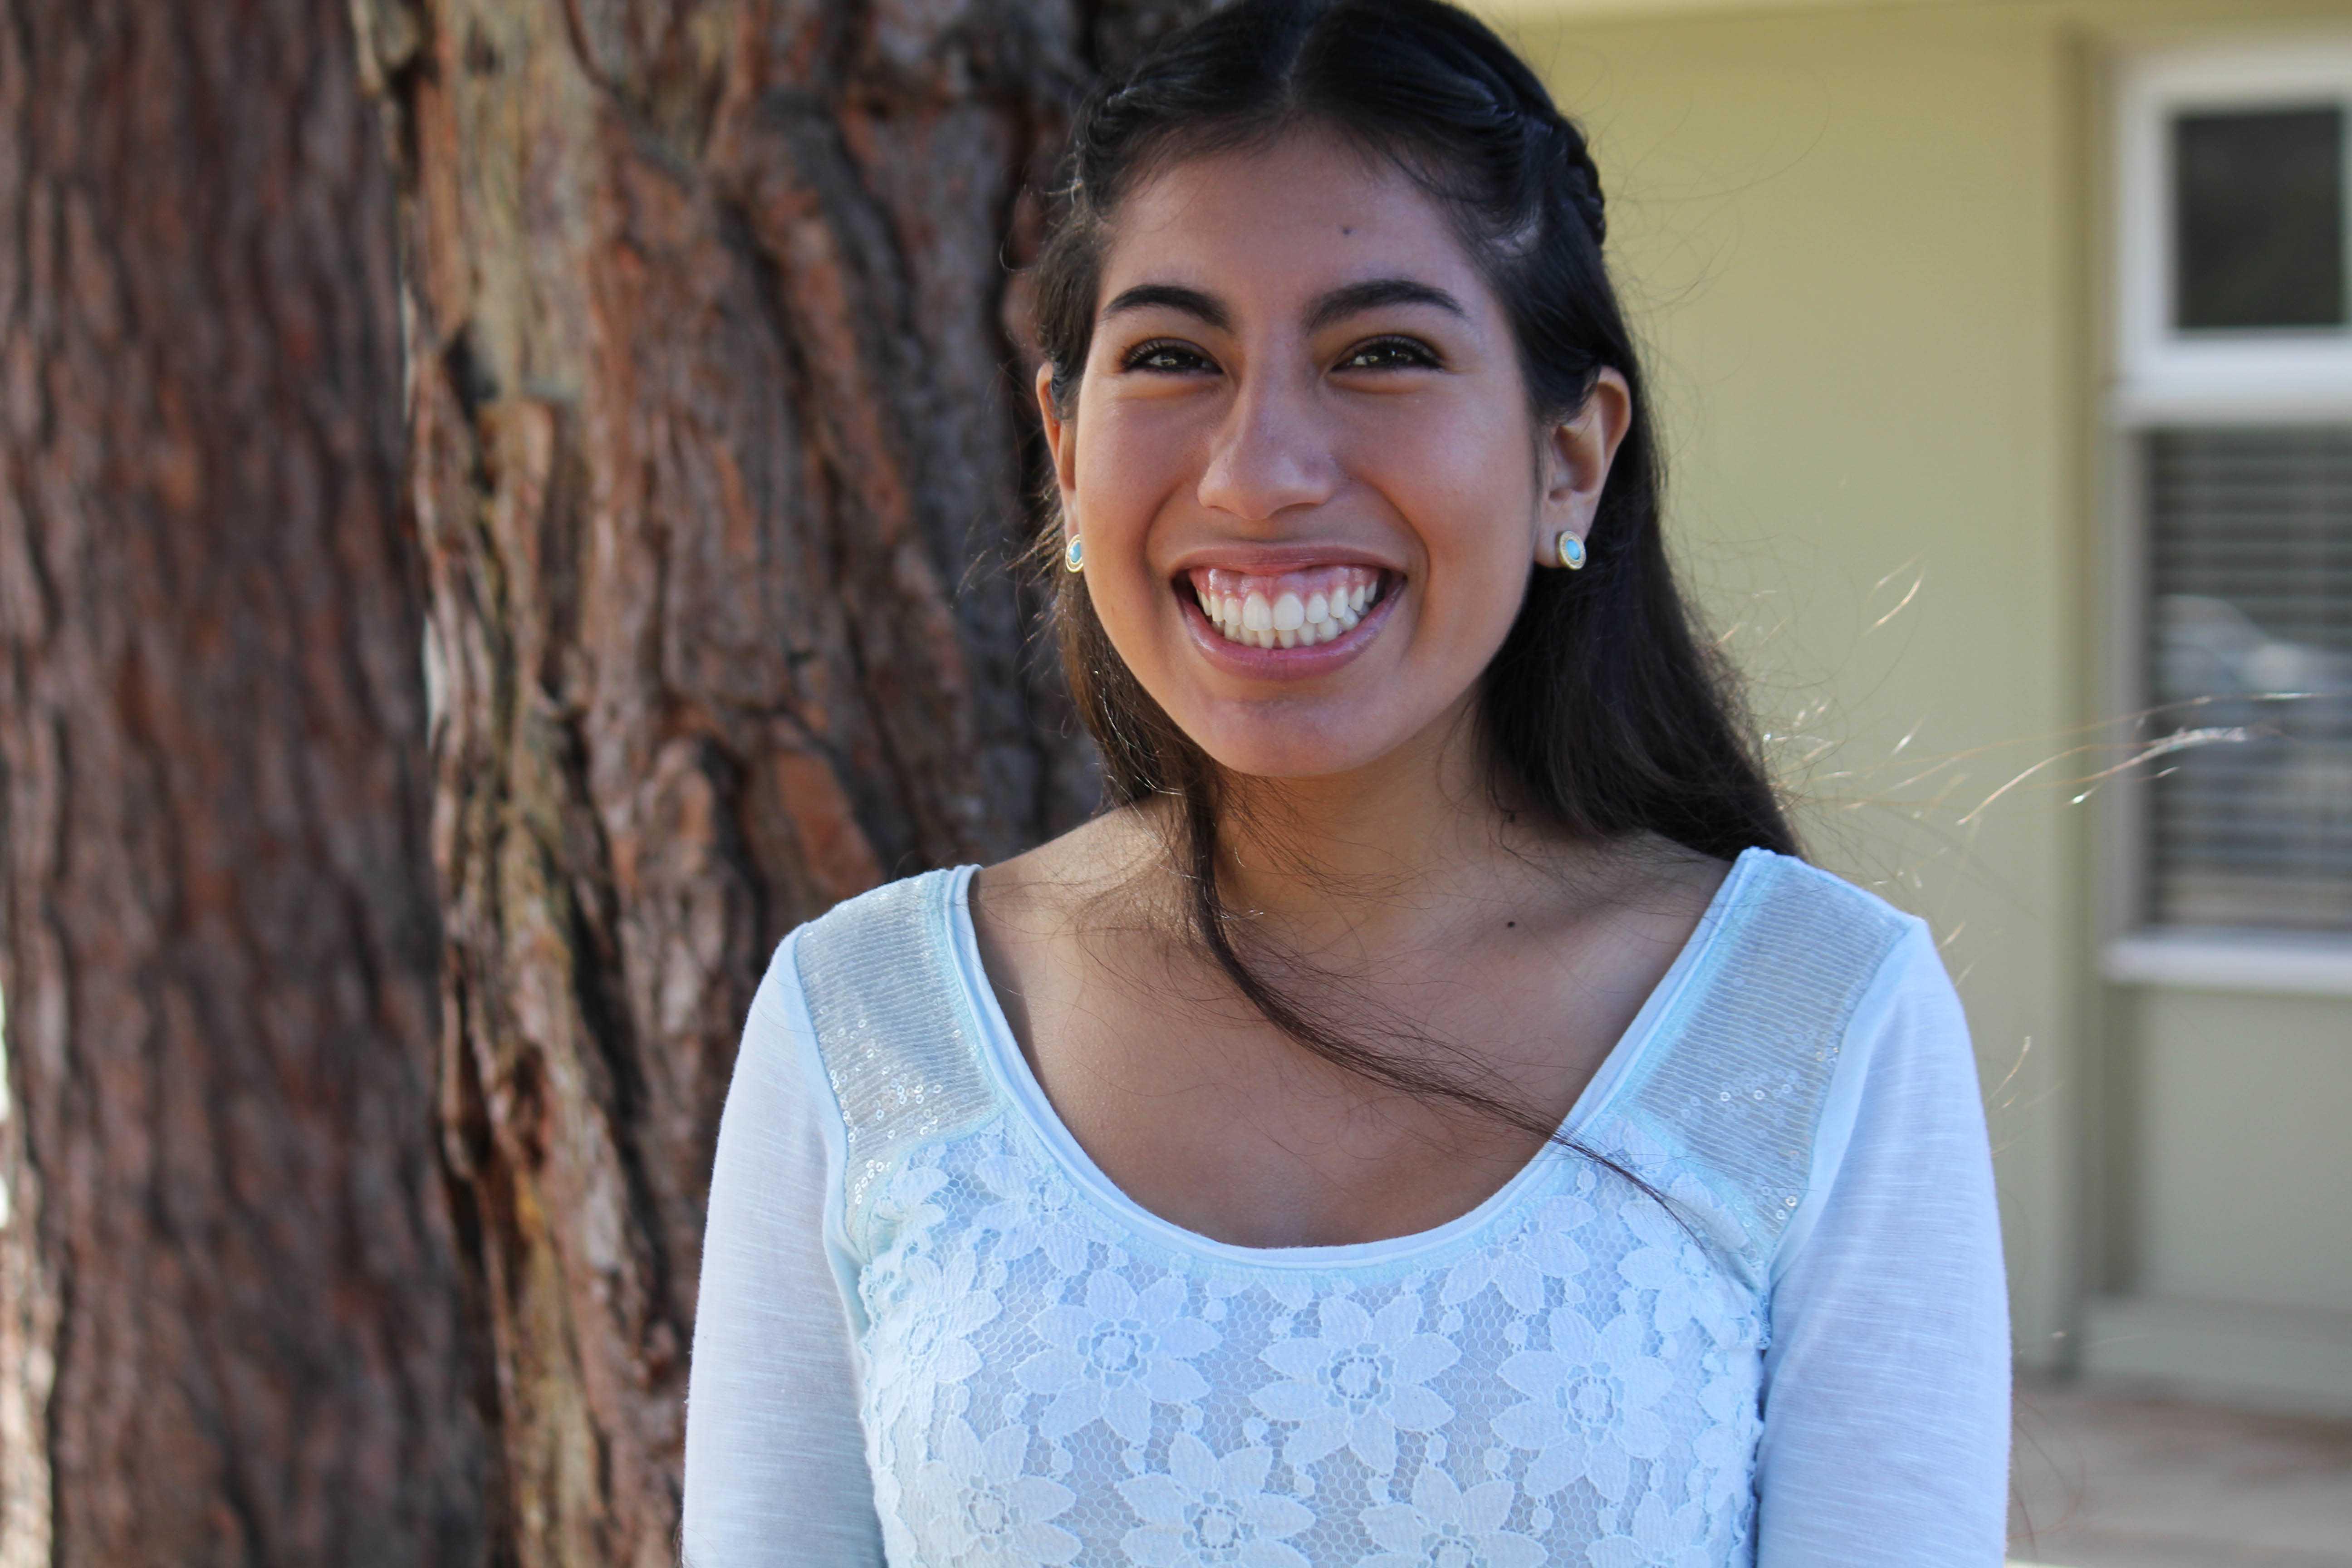 Leticia Camacho (photo by Nicole Trenchard)